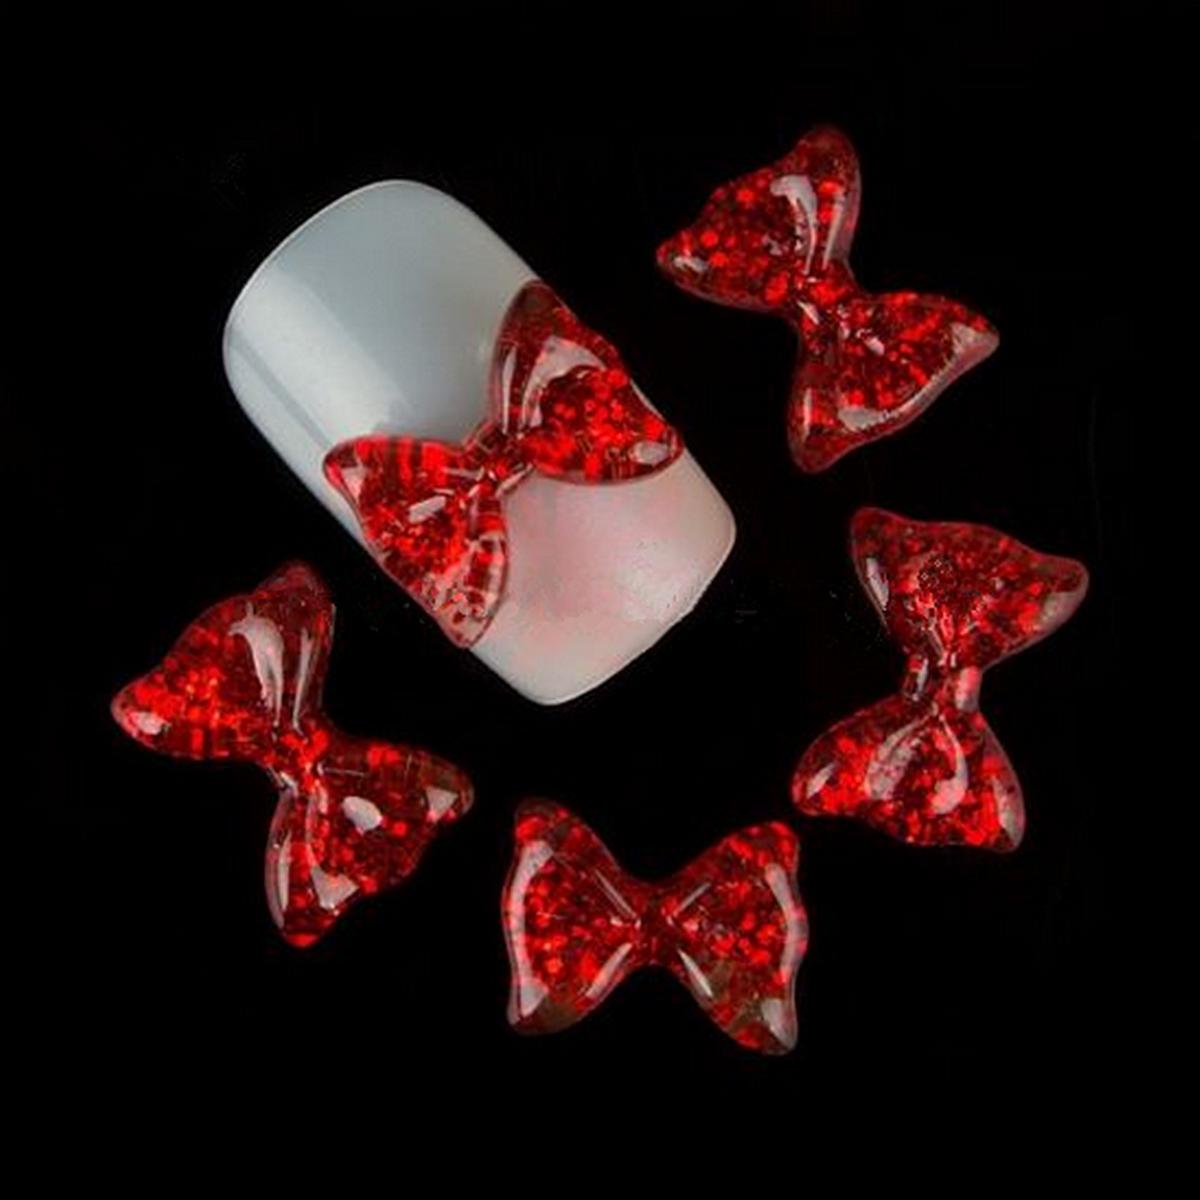 10X Nail Art DIY Decoration Big Bow Resin Crystal Glitter Rhinestone Phone Craft